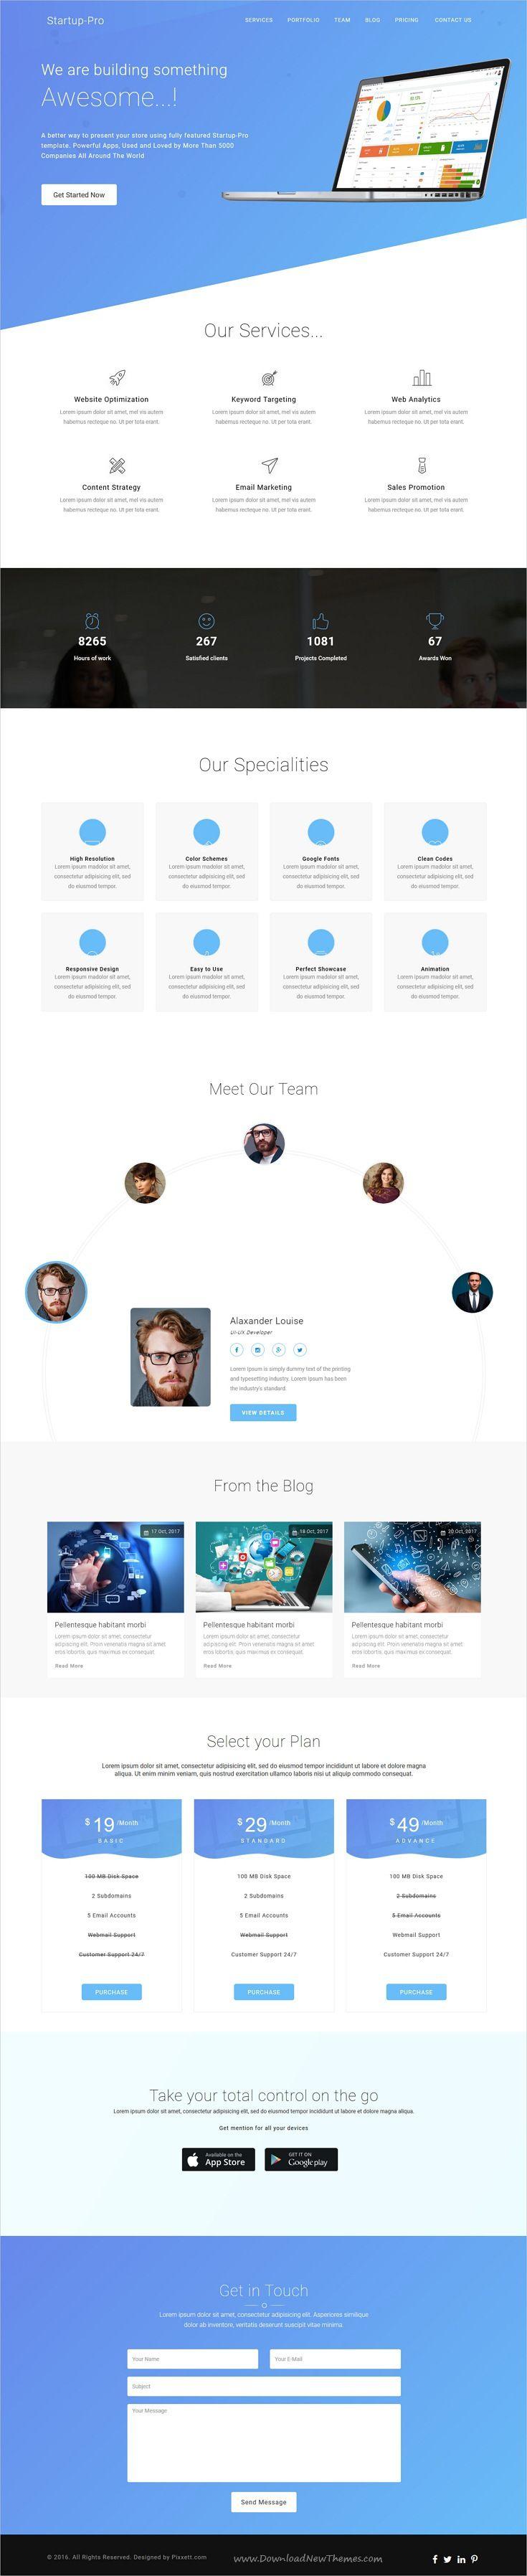 Startup Pro - Software, SaaS, WebApp Development Template